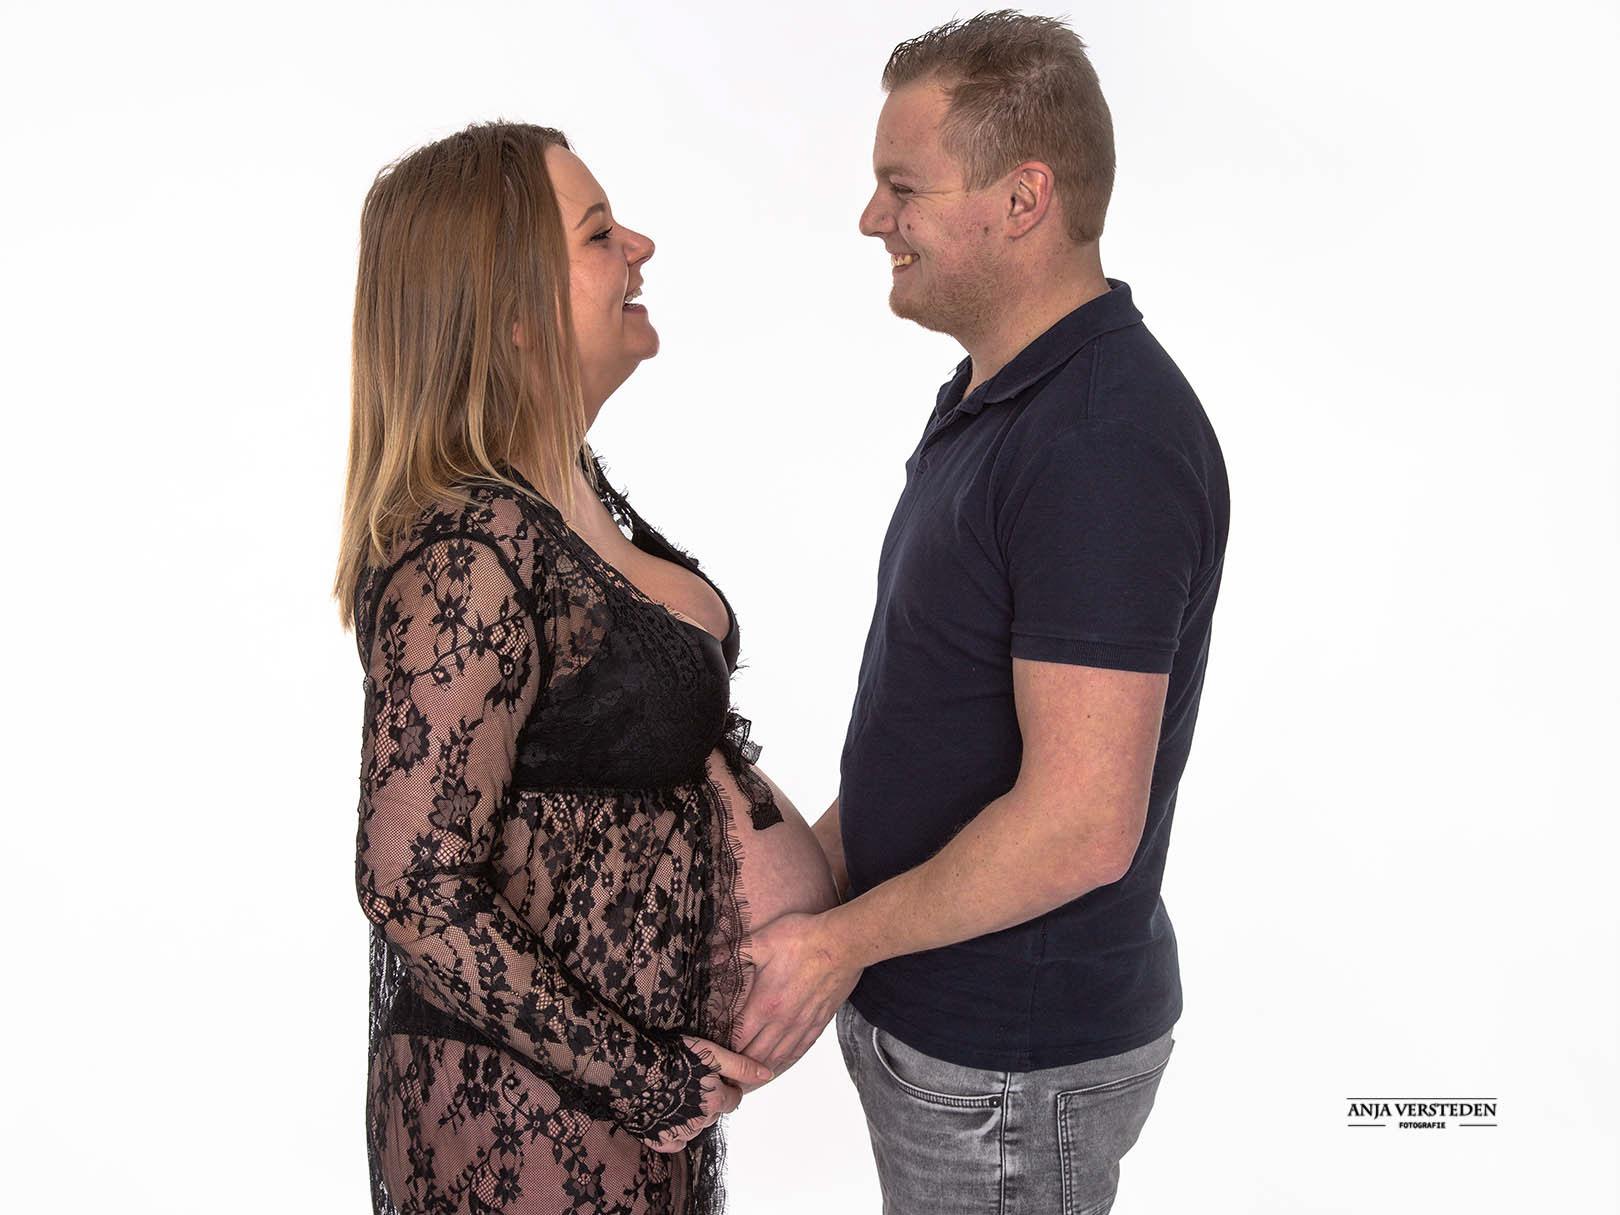 Zwangerschapsfotograaf Anja Versteden